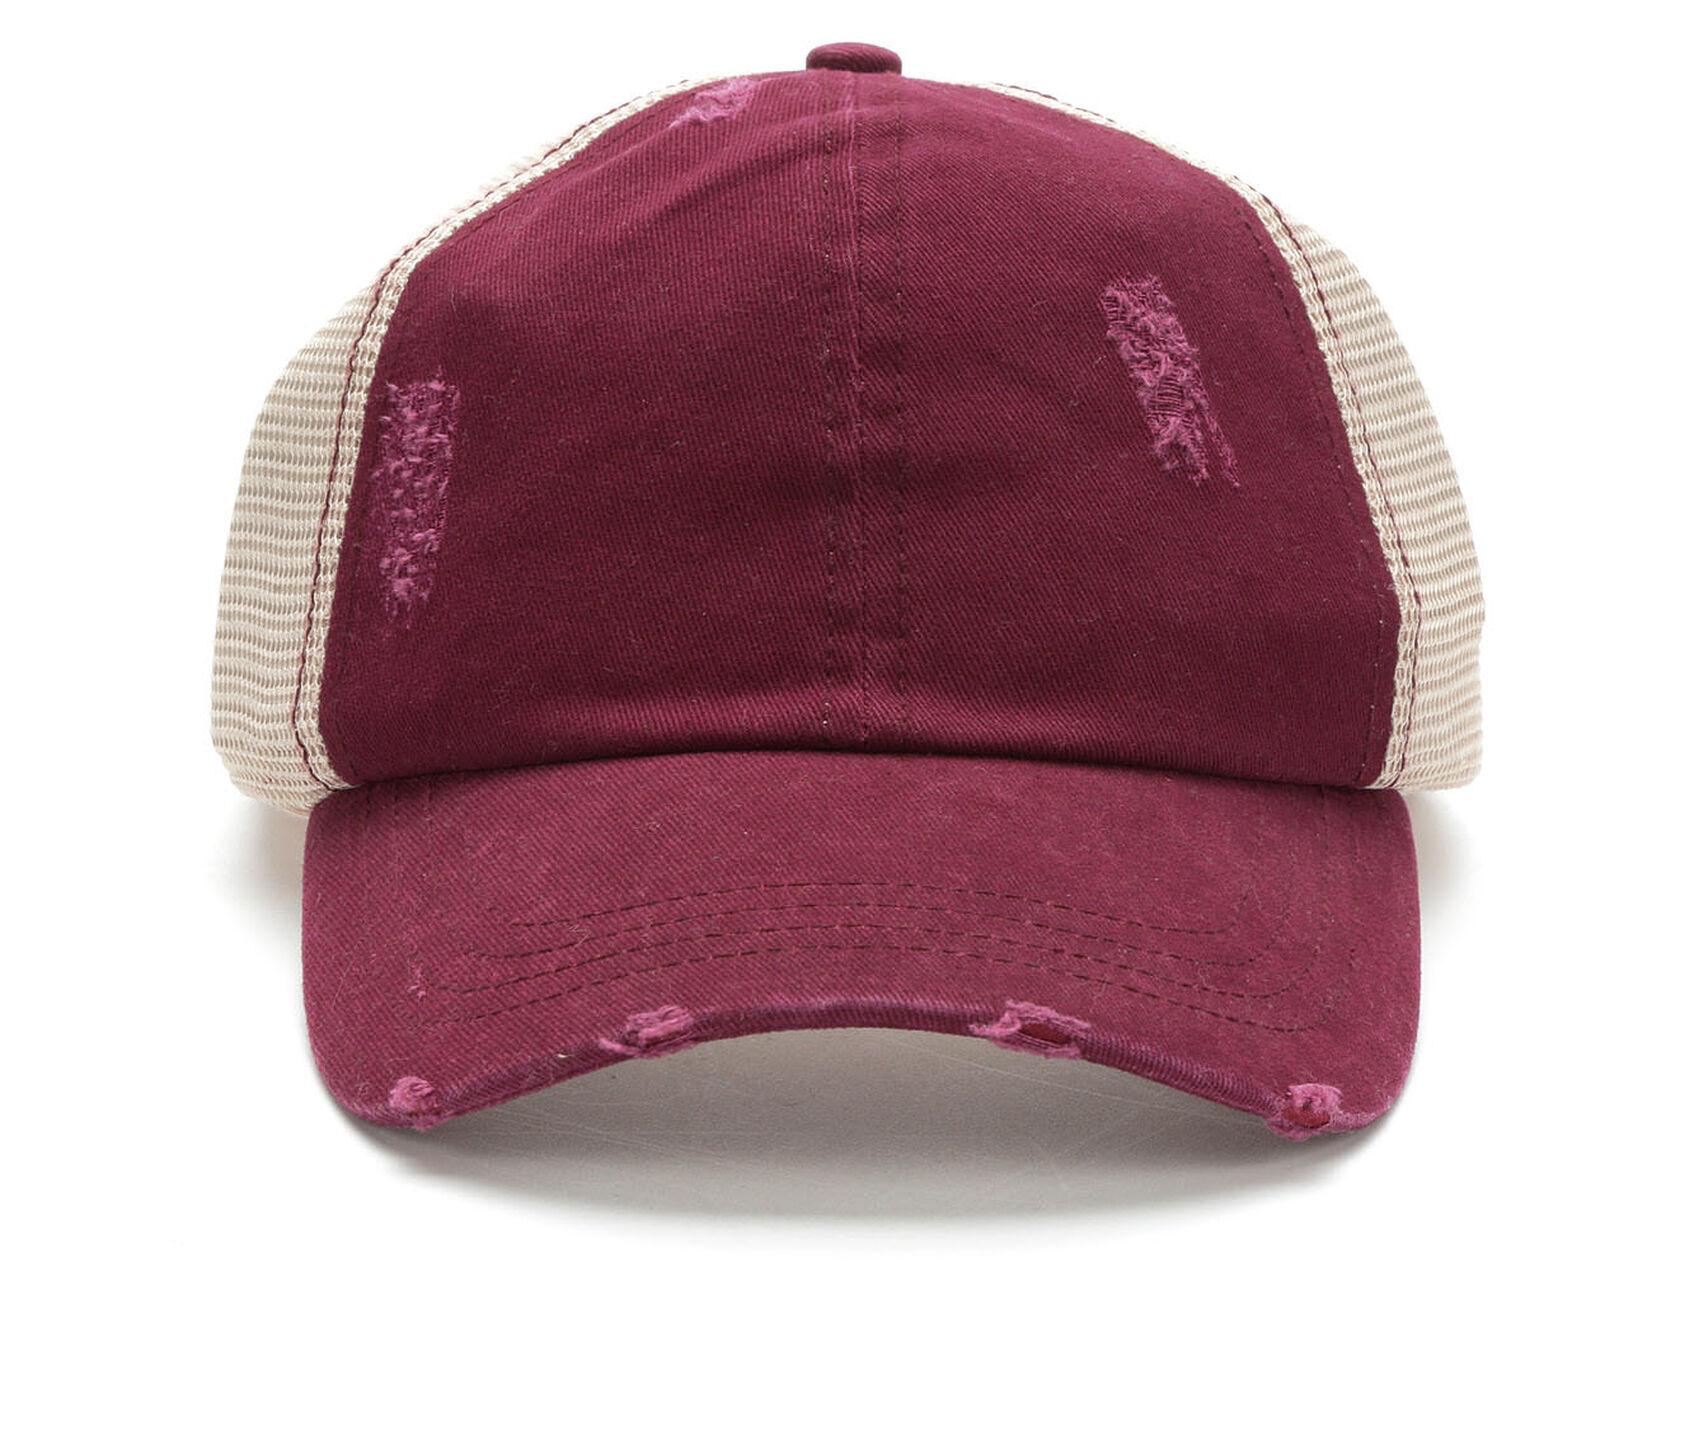 online retailer f550b 97247 ... Distressed Trucker Hat. Previous